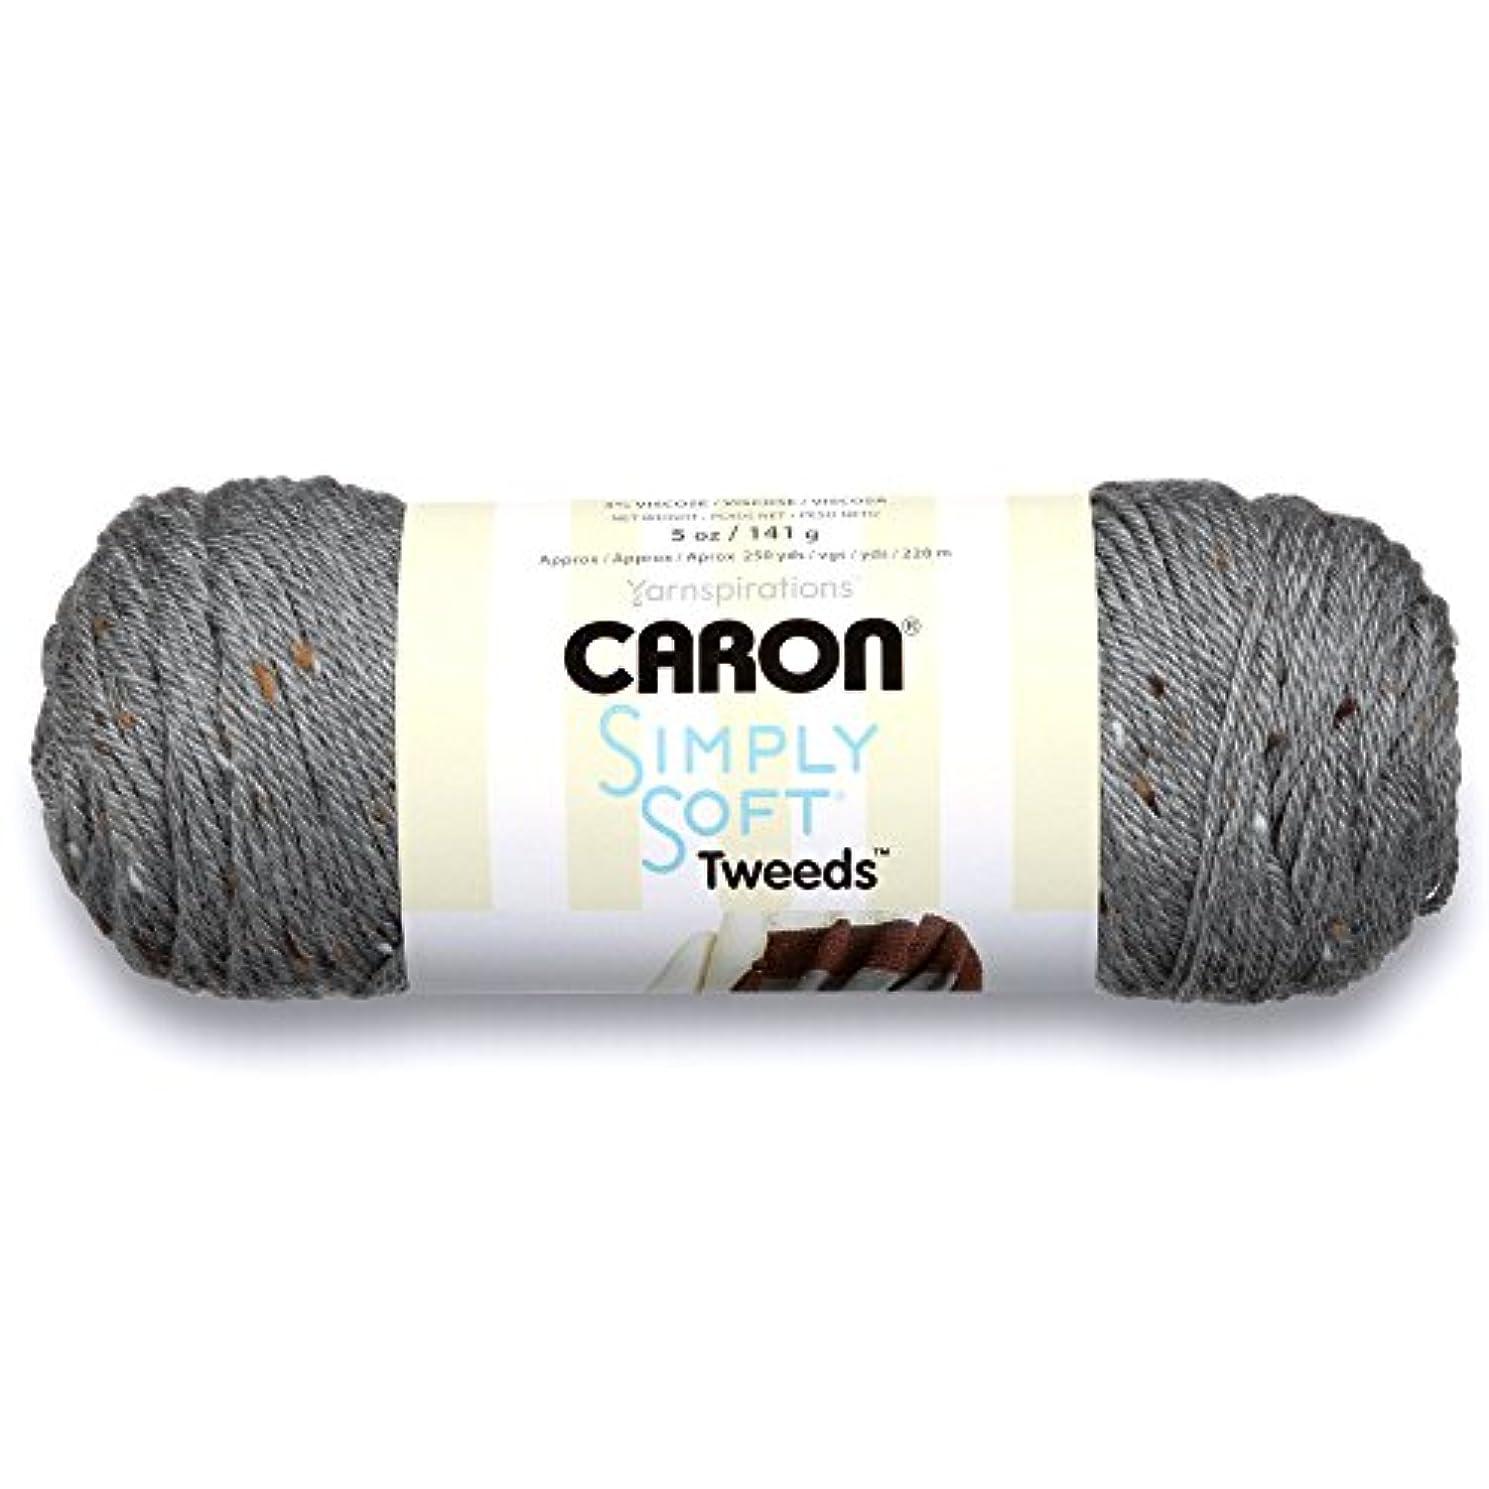 Caron Simply Soft Tweeds Yarn (4) Medium Gauge 100% Acrylic - 5oz - Gray -  Machine Wash & Dry